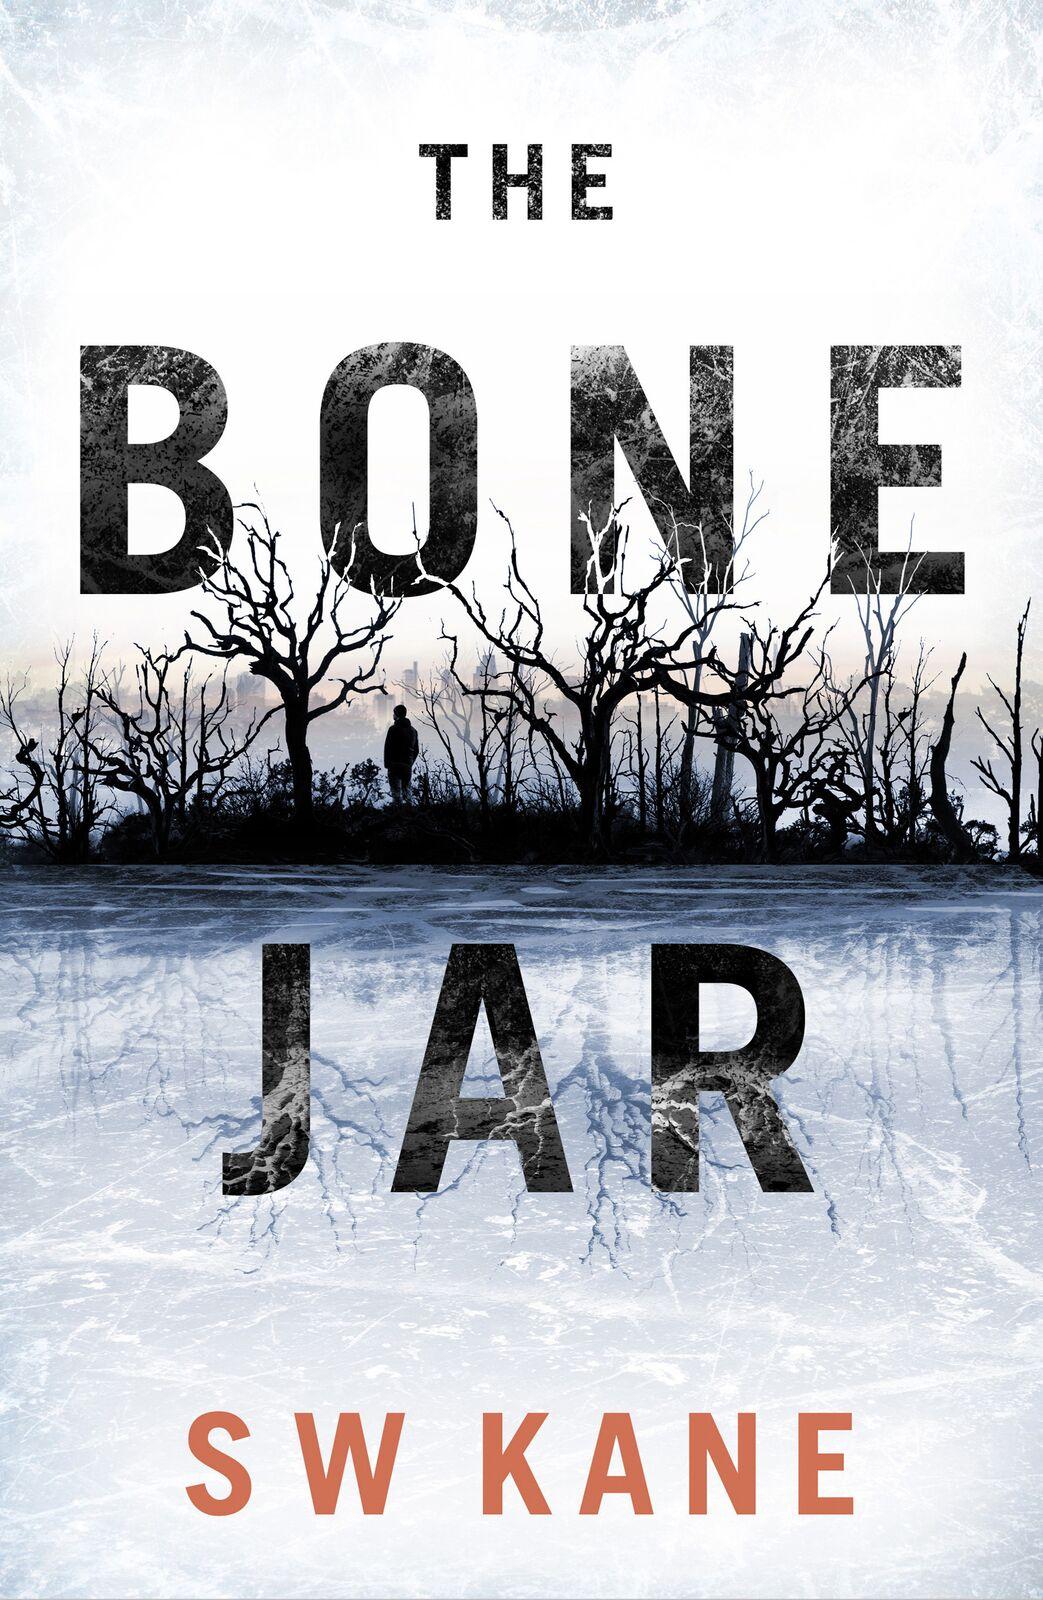 Cover art for The Bone Jar